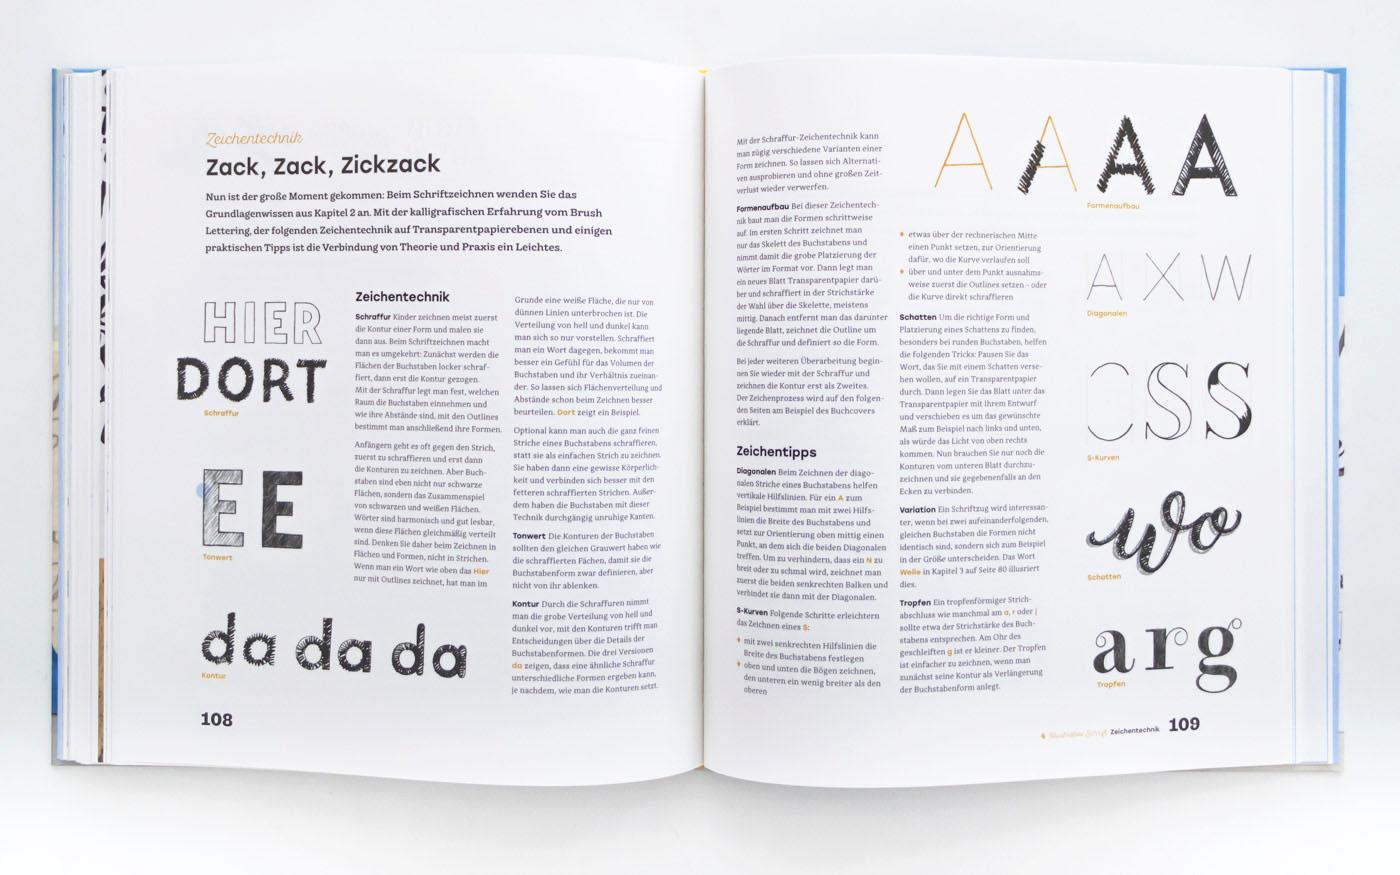 Handbuch Handlettering – Handlettering lernen mit Chris Campe, ISBN 978-3-258-60165-6